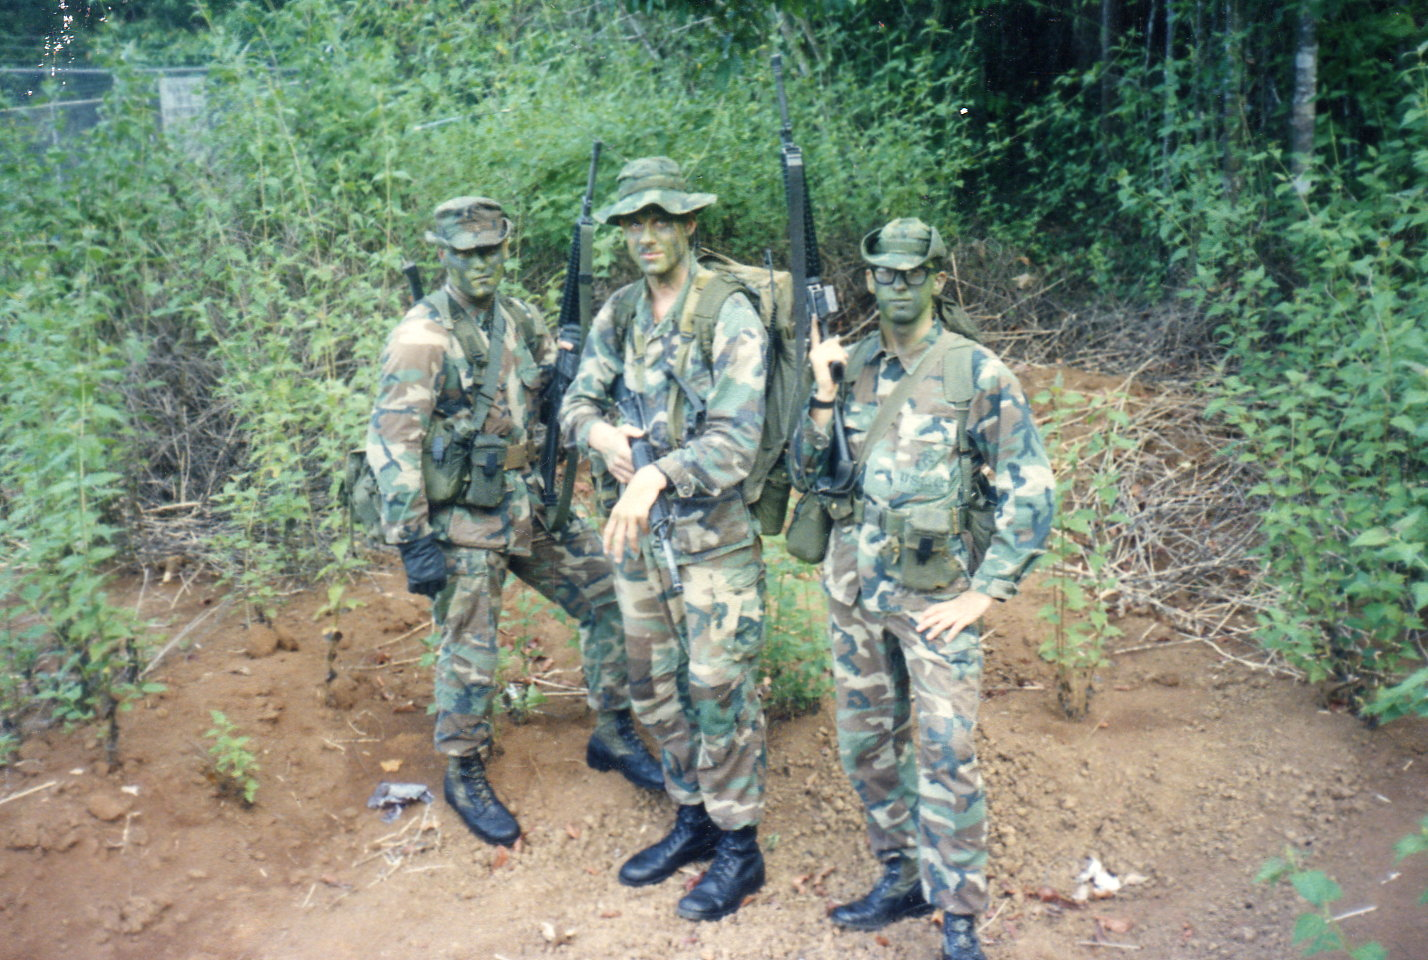 veterans united foundation scholarship essay prompts